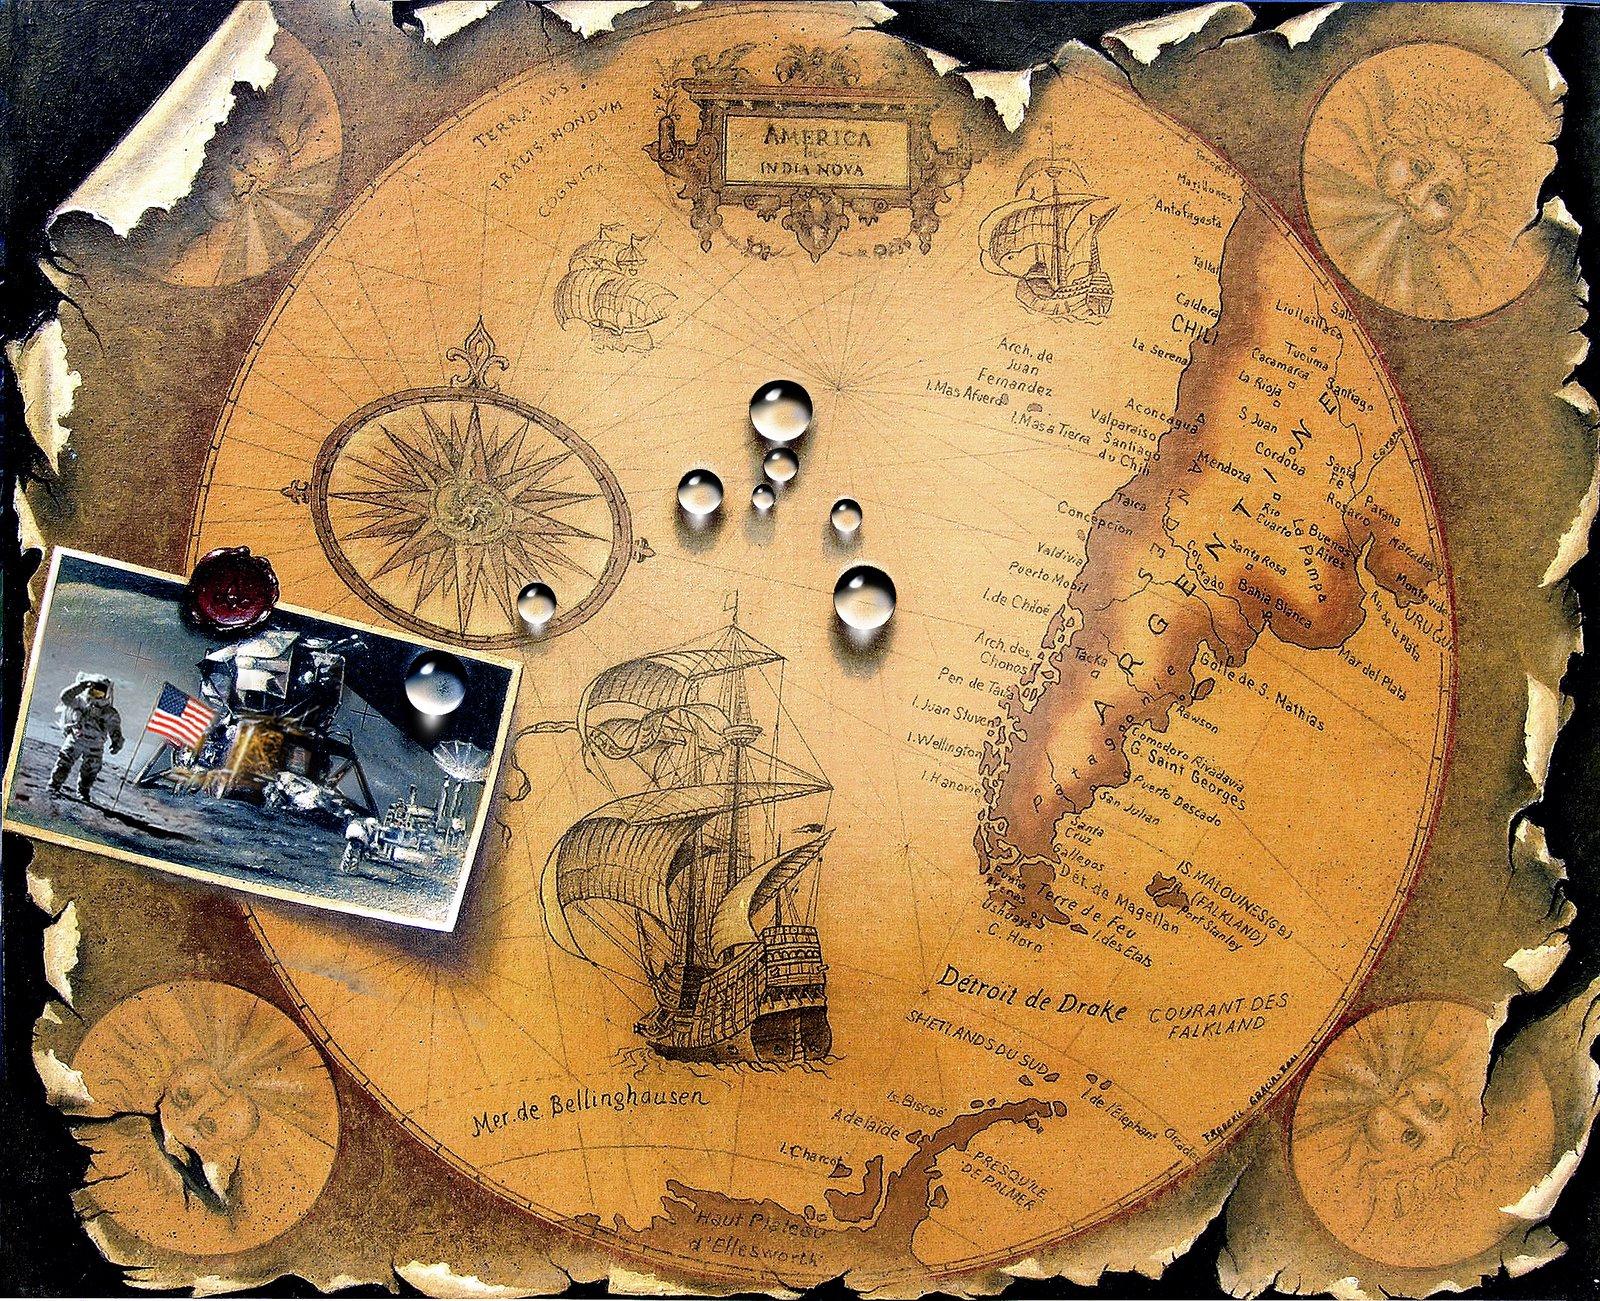 http://3.bp.blogspot.com/_LgJrIcBOotg/SYZOrGnO4ZI/AAAAAAAABB8/rqN8NQHG8D4/s1600/Terra+Incognita.jpg